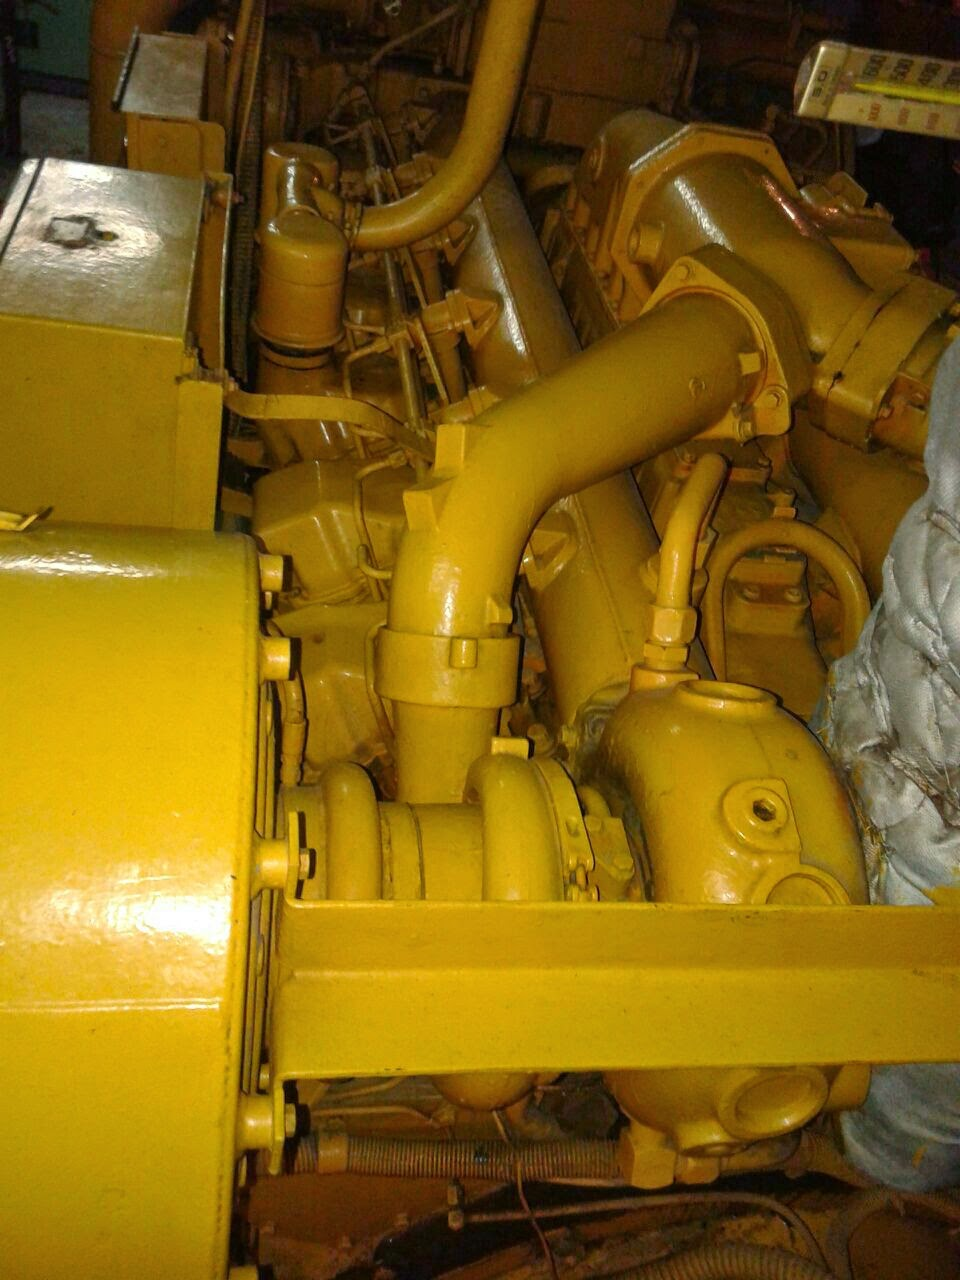 used caterpillar marine engines for sale, cat engine specs